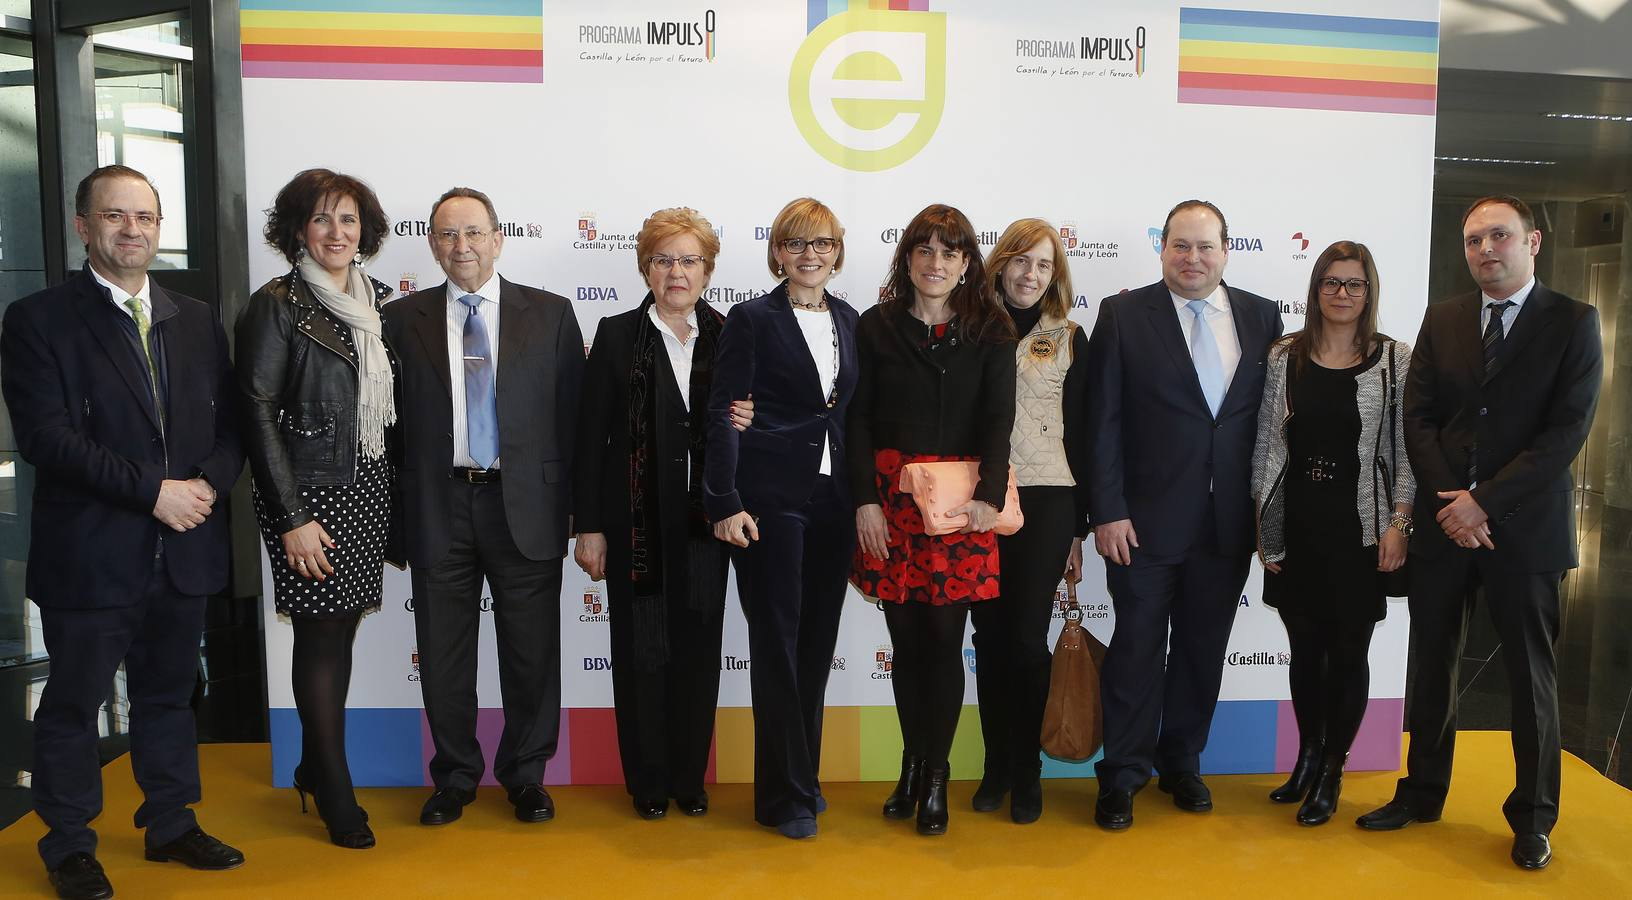 Programa impulso Beatriz Pharmadus